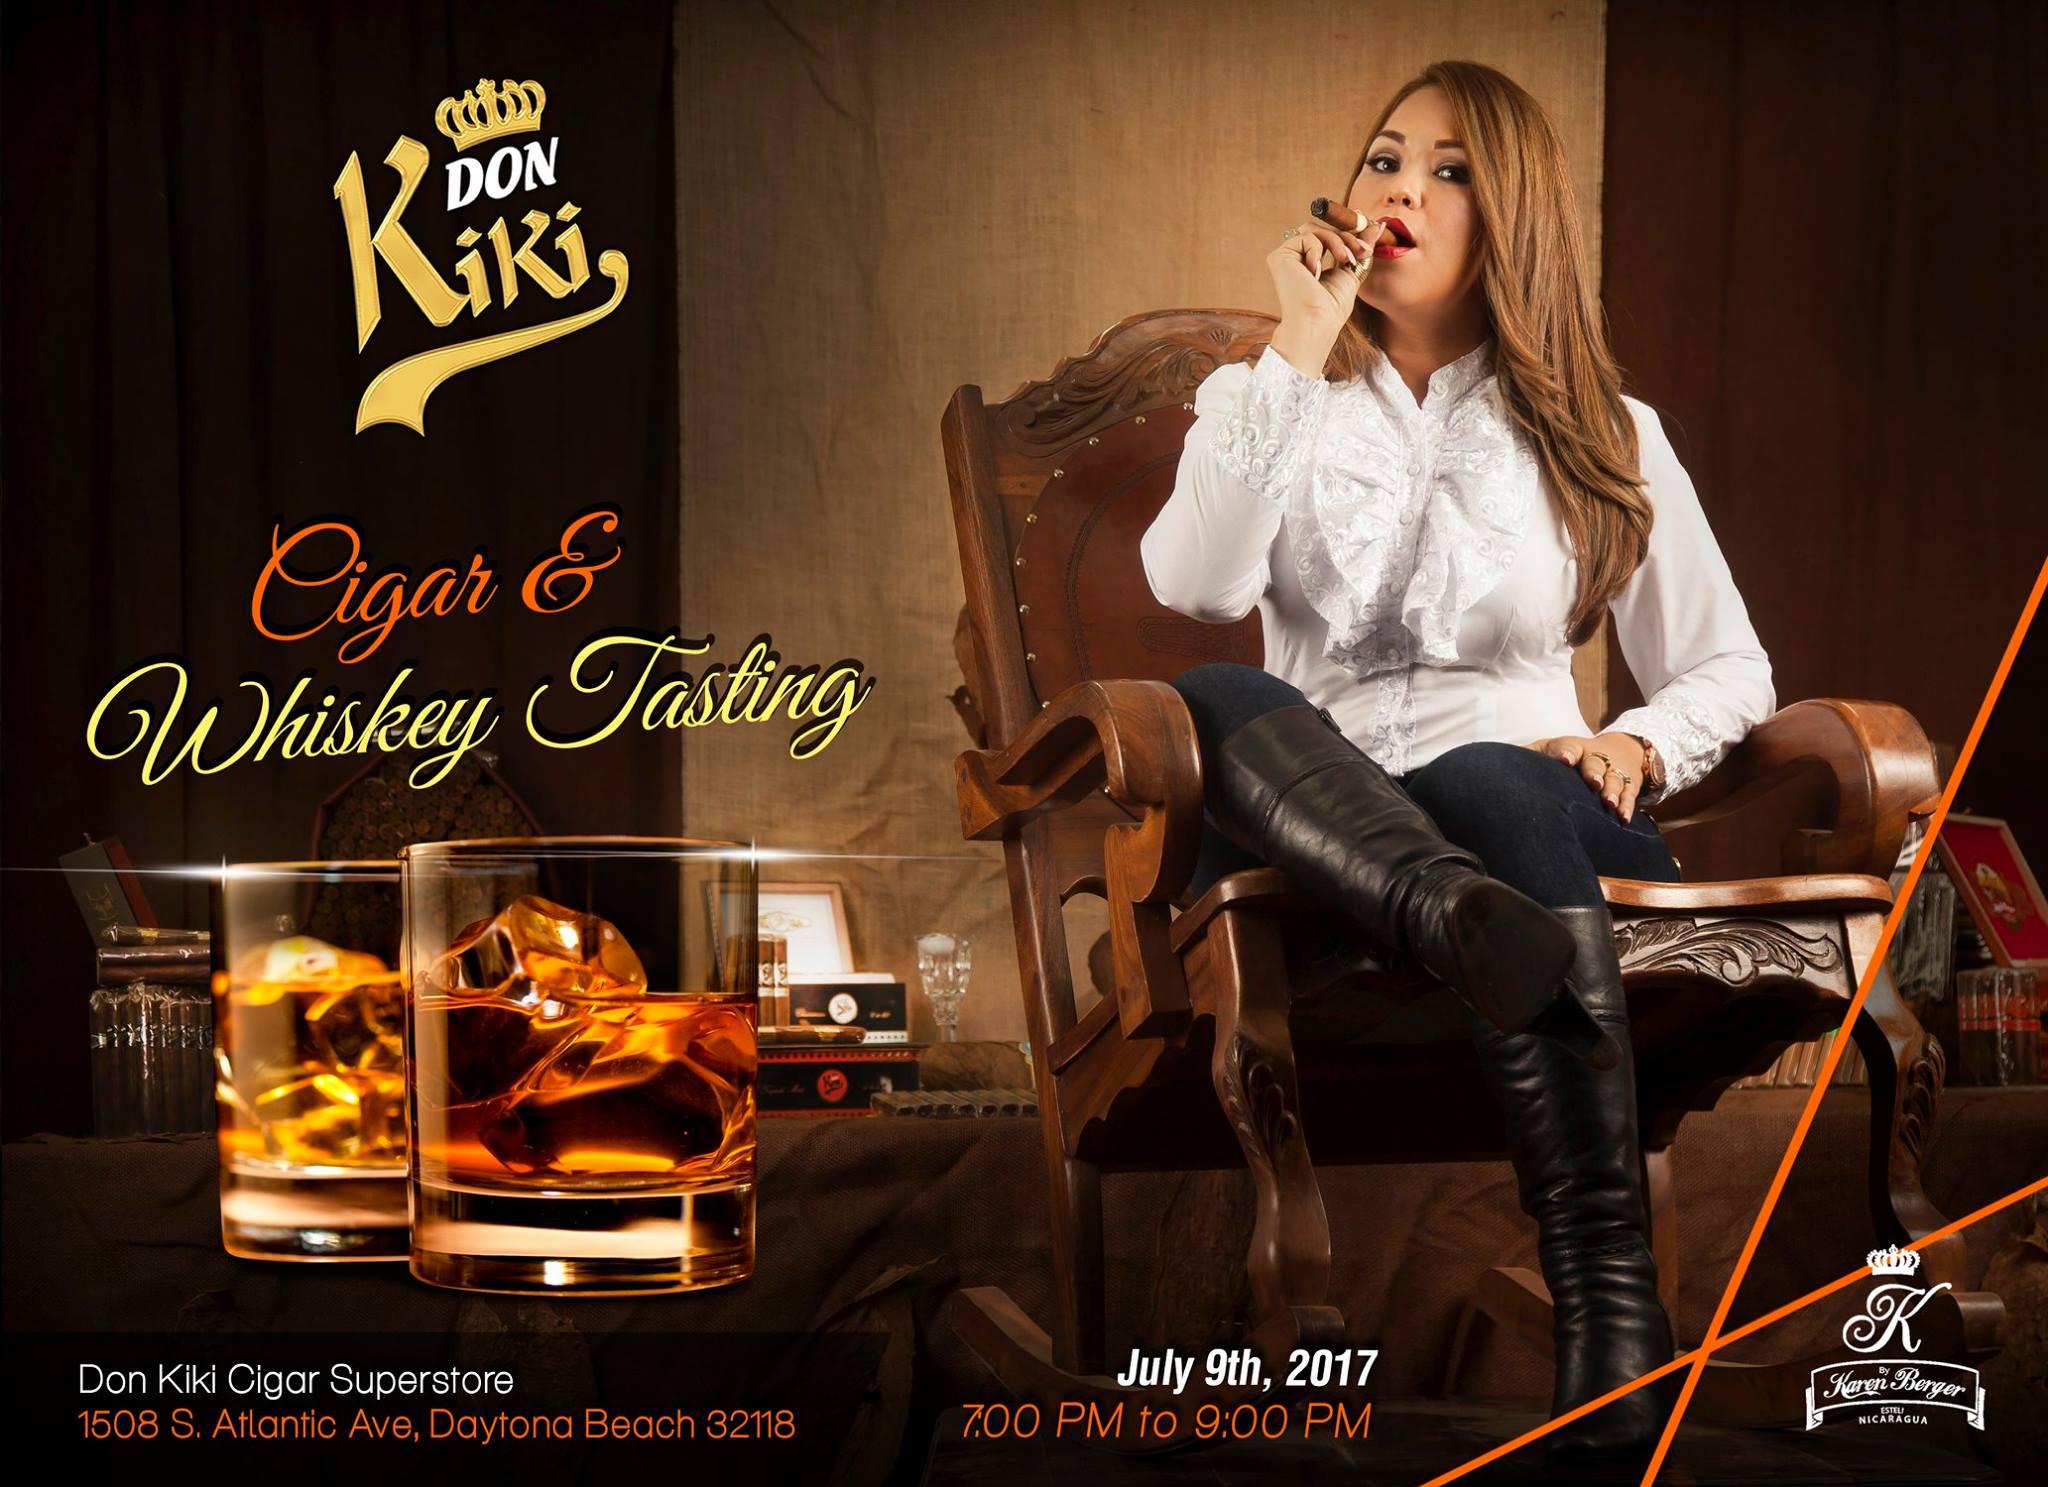 k_by_karen_berger_don_kiki_cigars_nicaraguai_szivarok_3.jpg